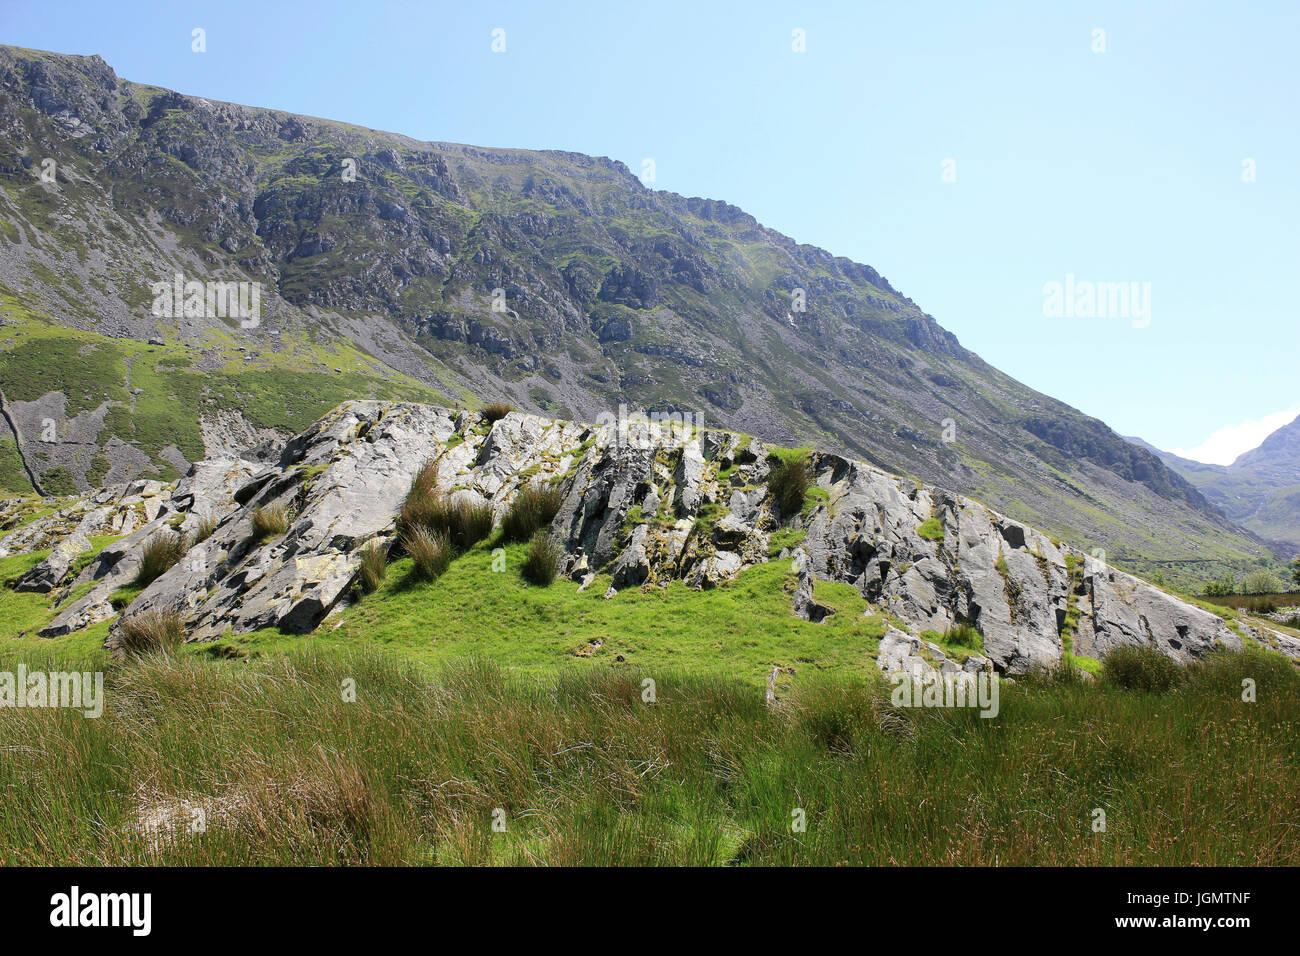 Roche Mountonee, Nant Francon Valley, Wales - Stock Image